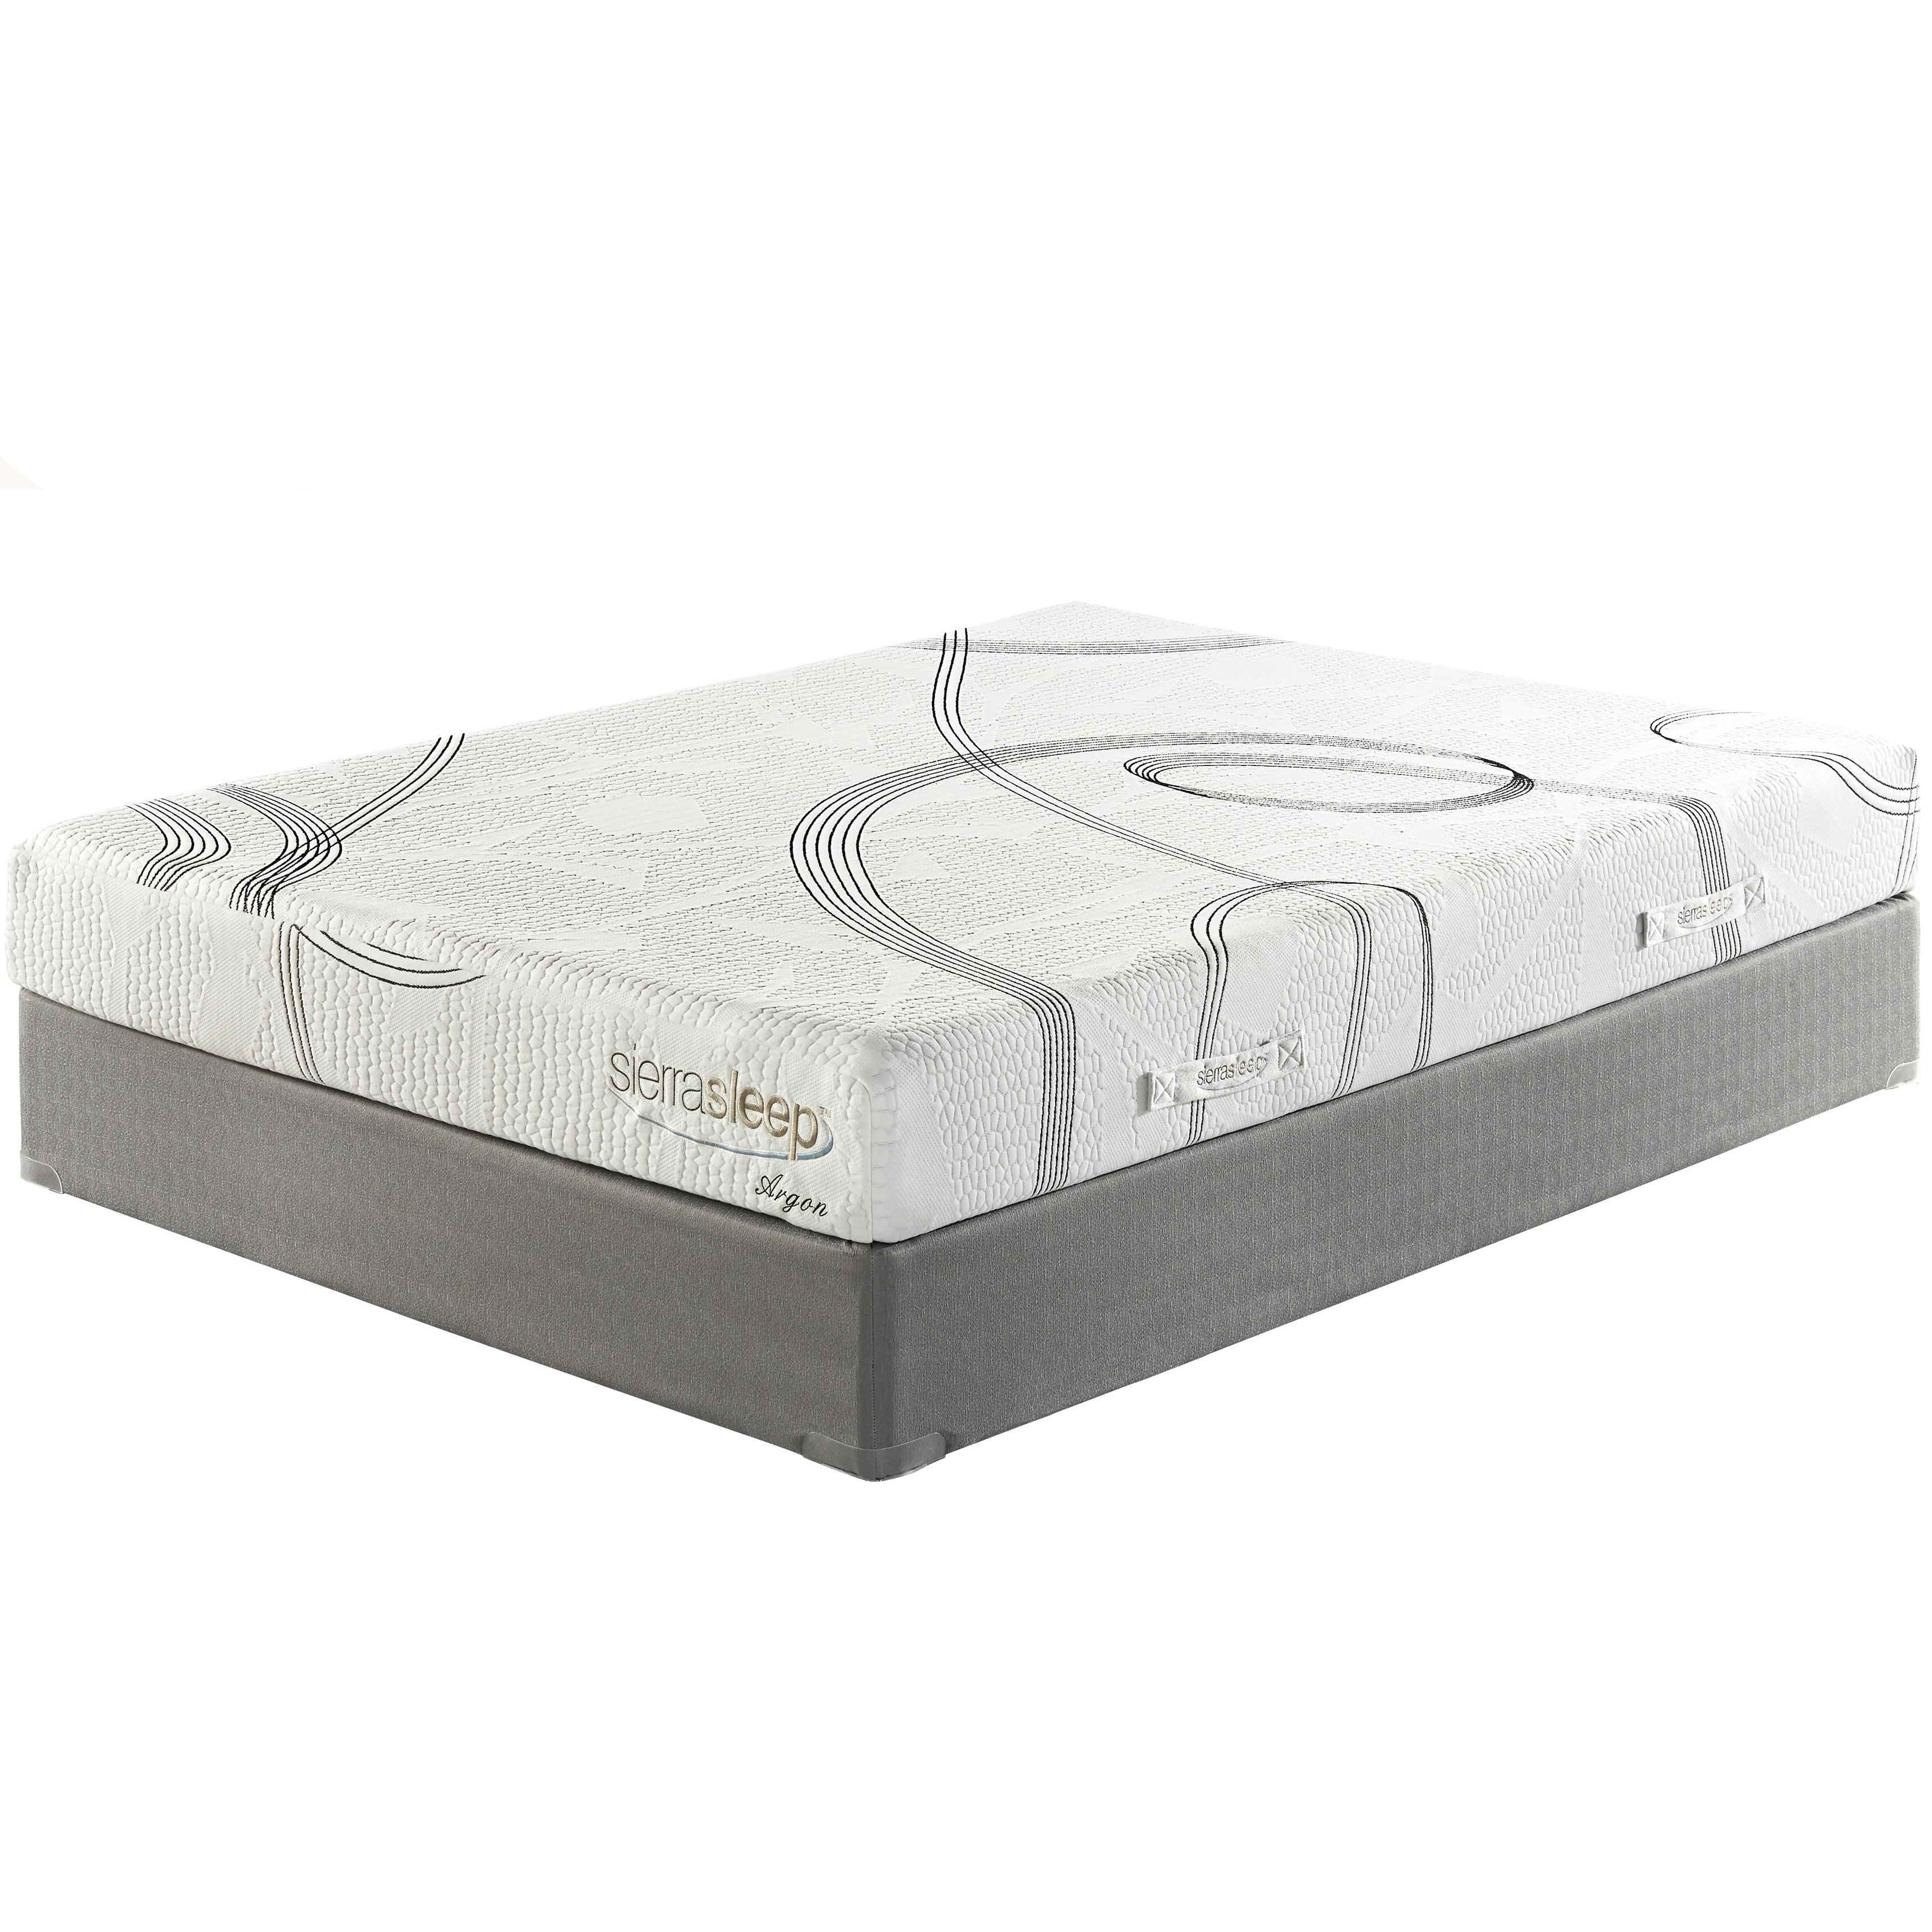 Sierra Sleep 8 Inch Plush Memory Foam Queen Plush Mattress Set - Item Number: M99031+M81X32